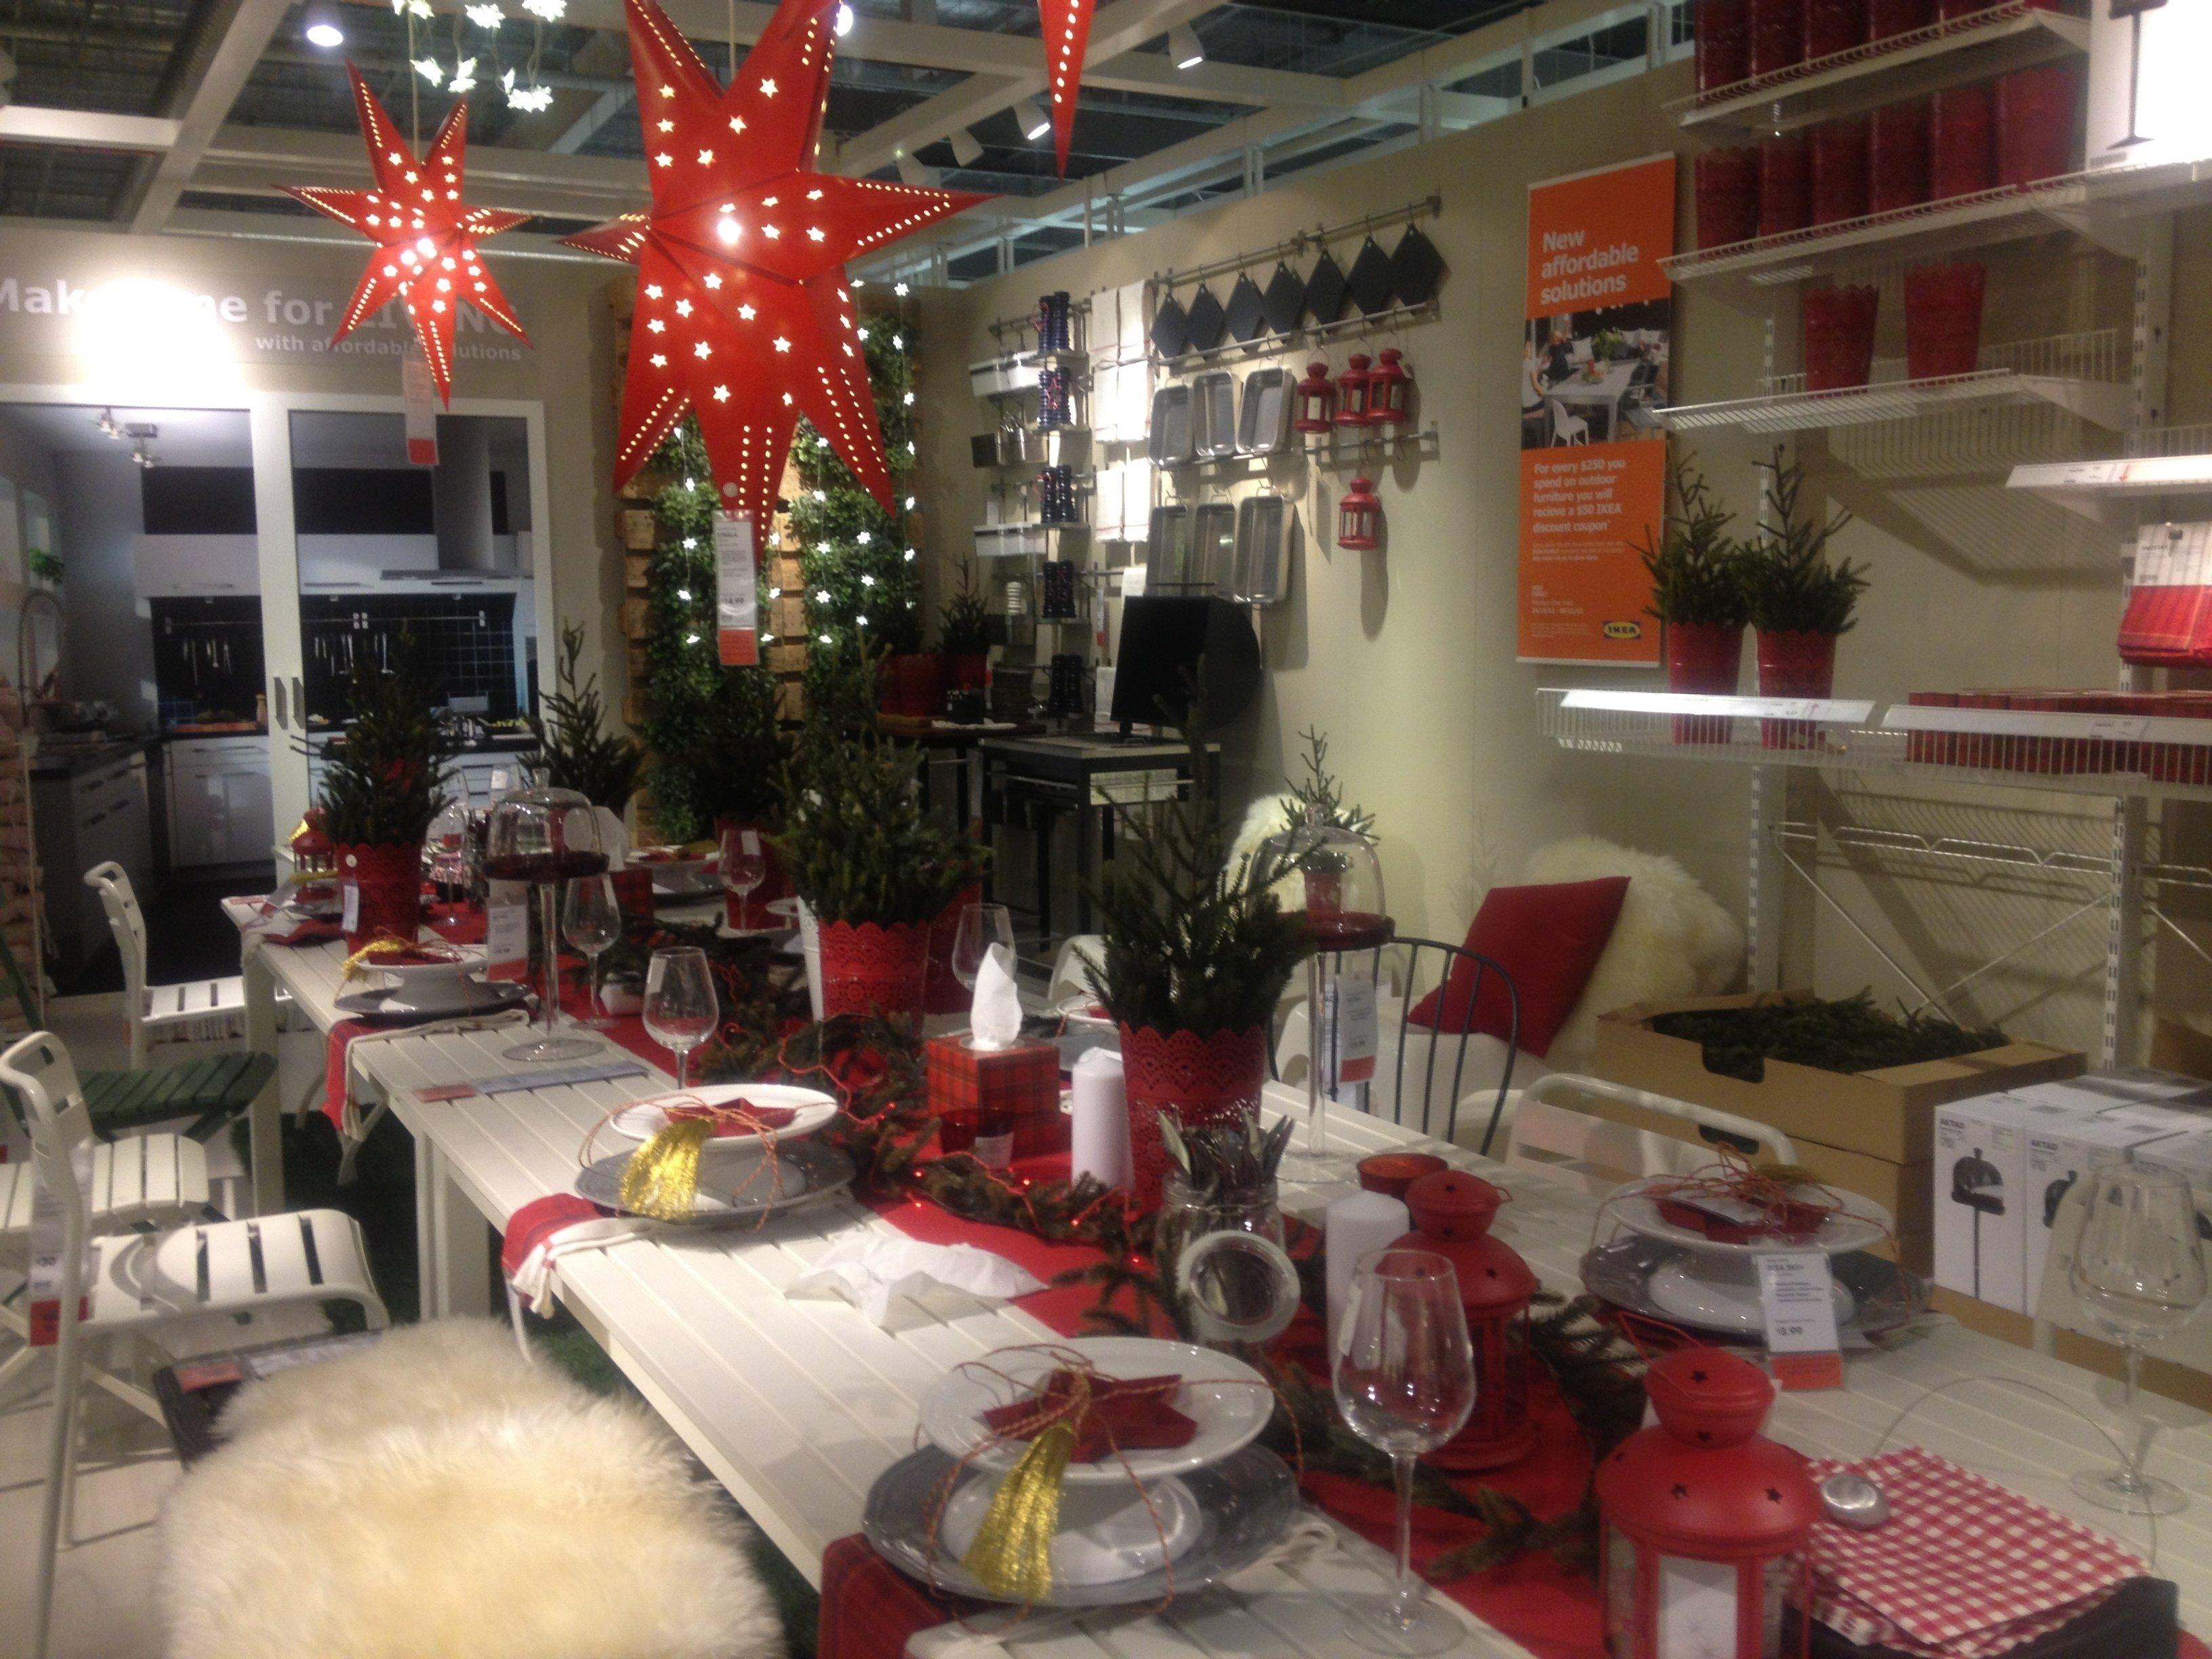 10 Gorgeous Best Christmas Gift Ideas 2013 ikea christmas gift ideas 2013 1 2021